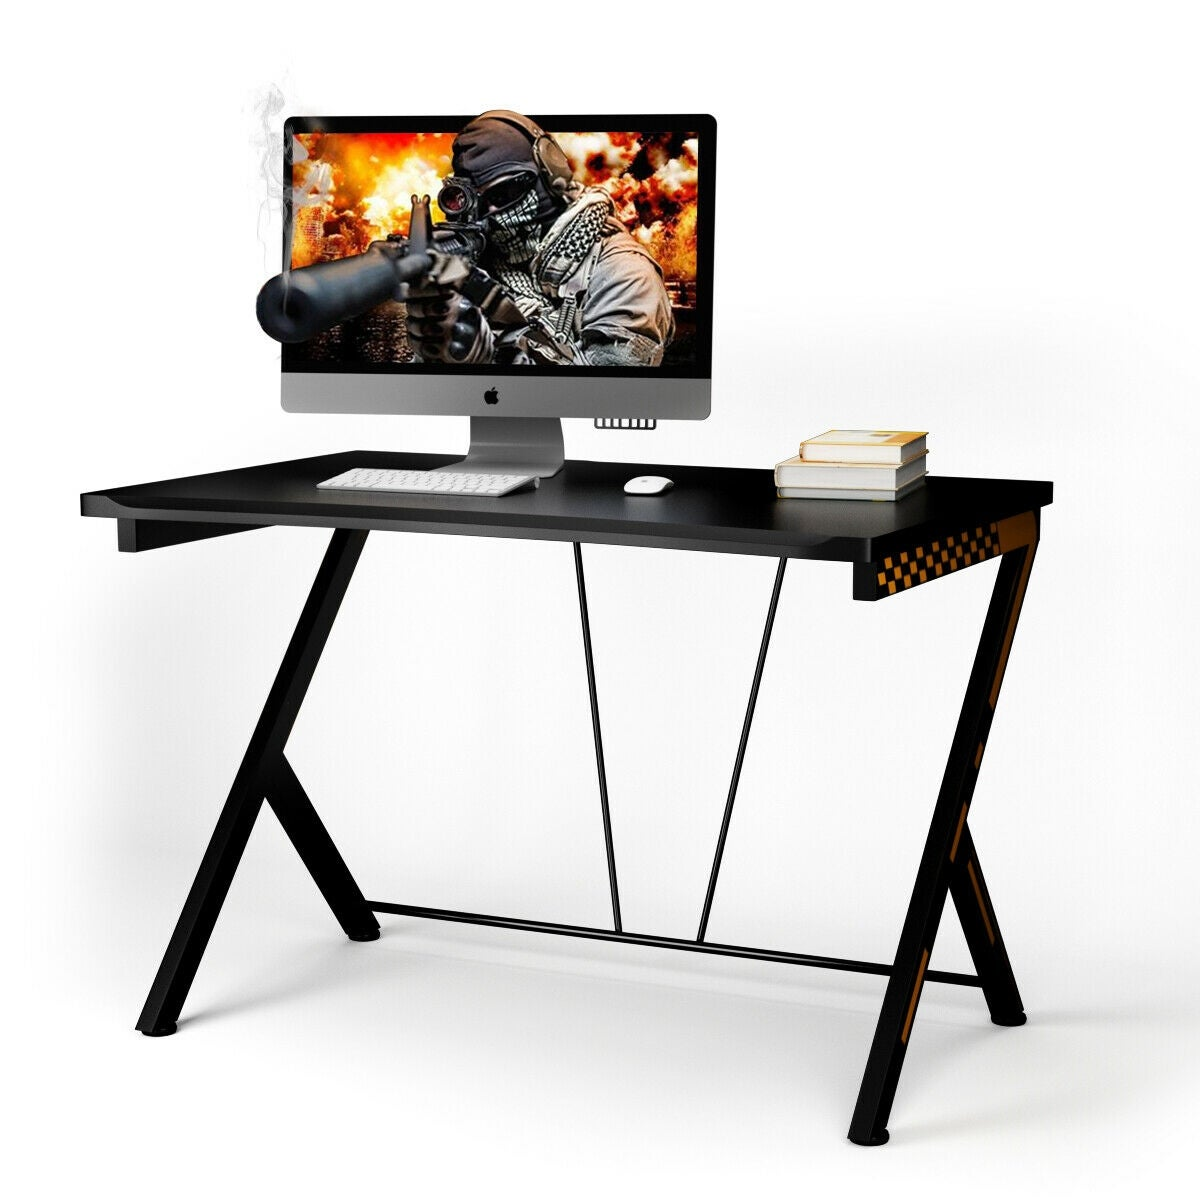 - Shop Costway Gaming Desk Computer Desk PC Laptop Table Workstation